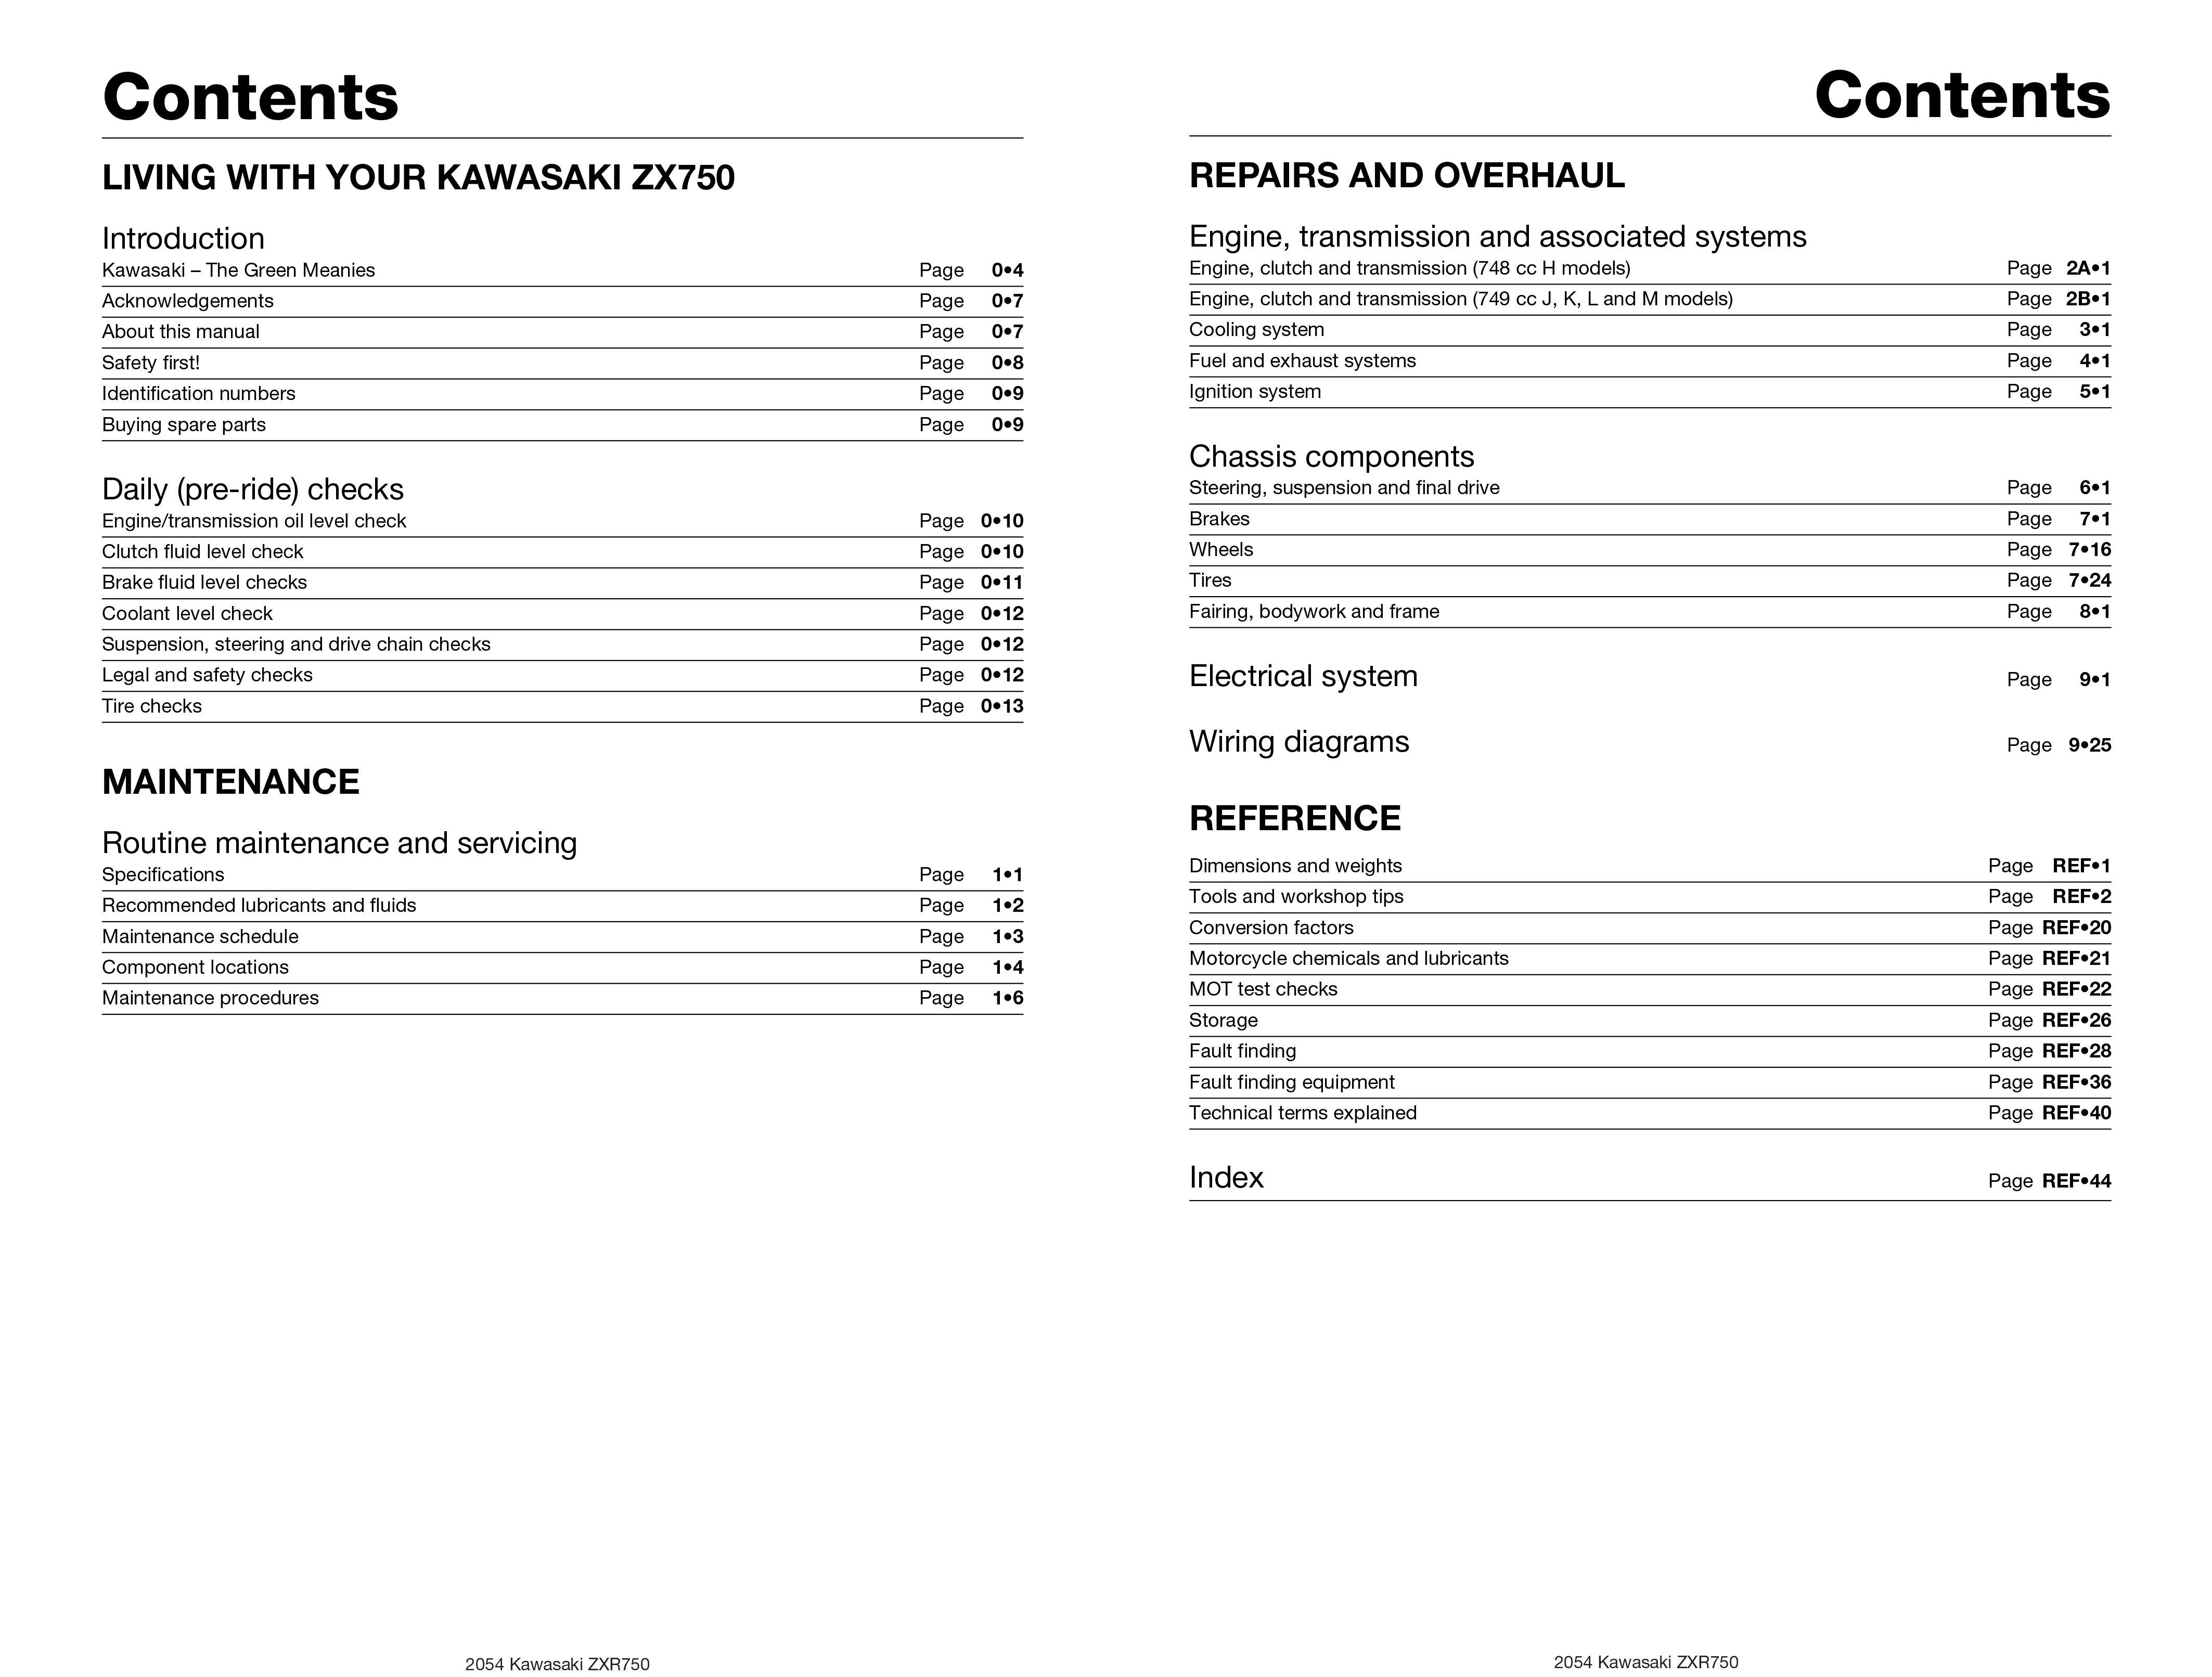 HAYNES Repair Manual - Kawasaki ZX750 (Ninja ZX-7 & ZXR750) Fours (89-96)